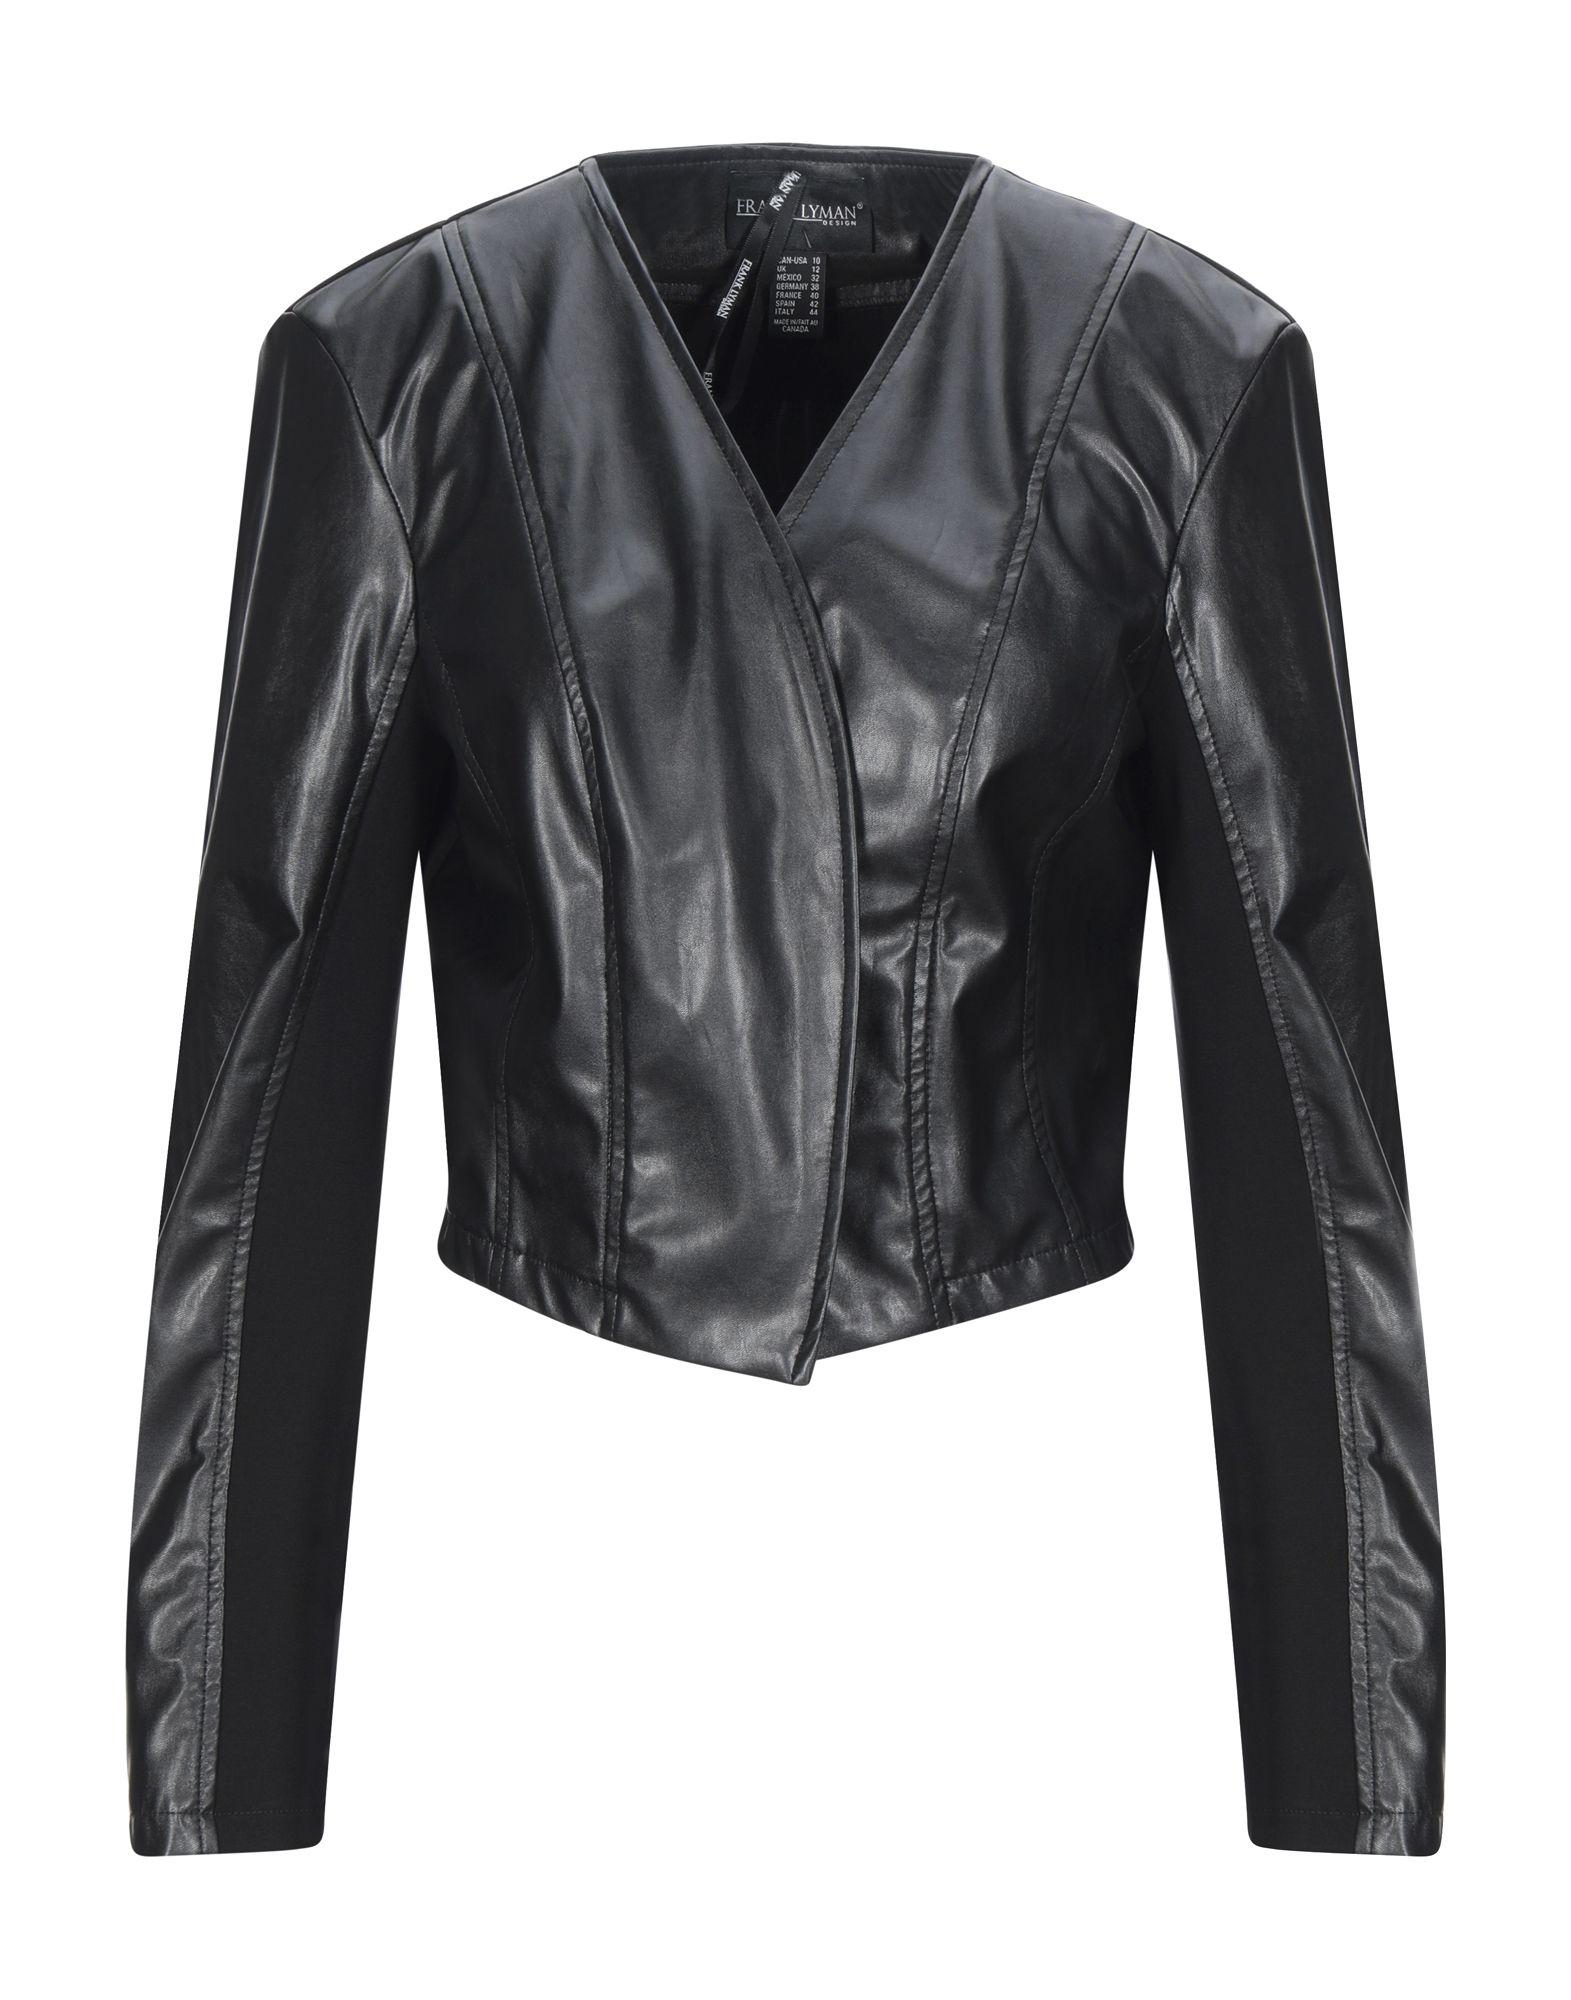 FRANK LYMAN Suit jackets - Item 49562819